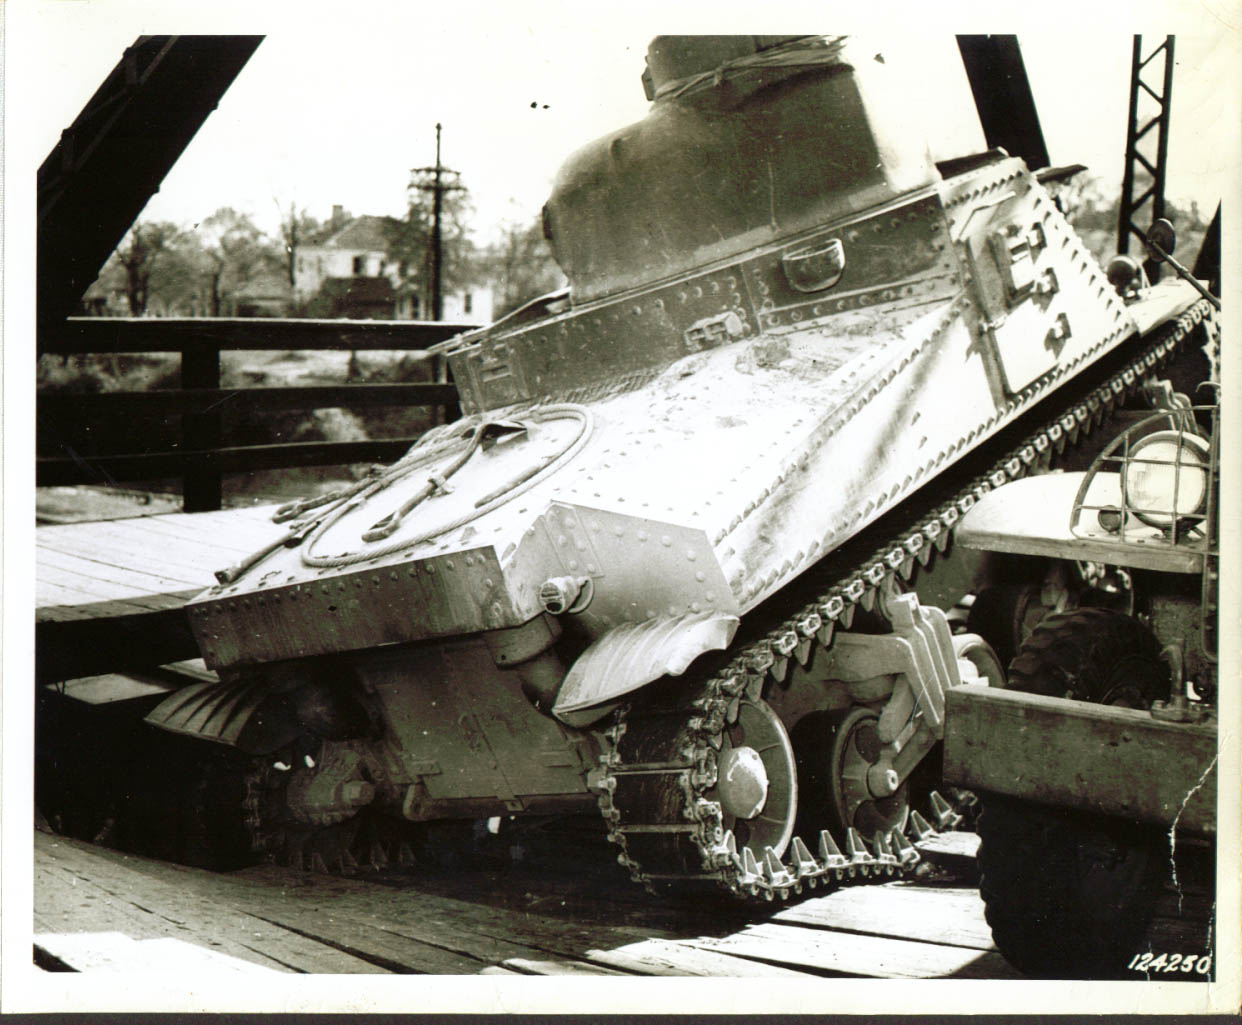 1st Army tank cracks bridge deck Monroe, NC 1941 (negative reversed - sponson gun would be on the right side)